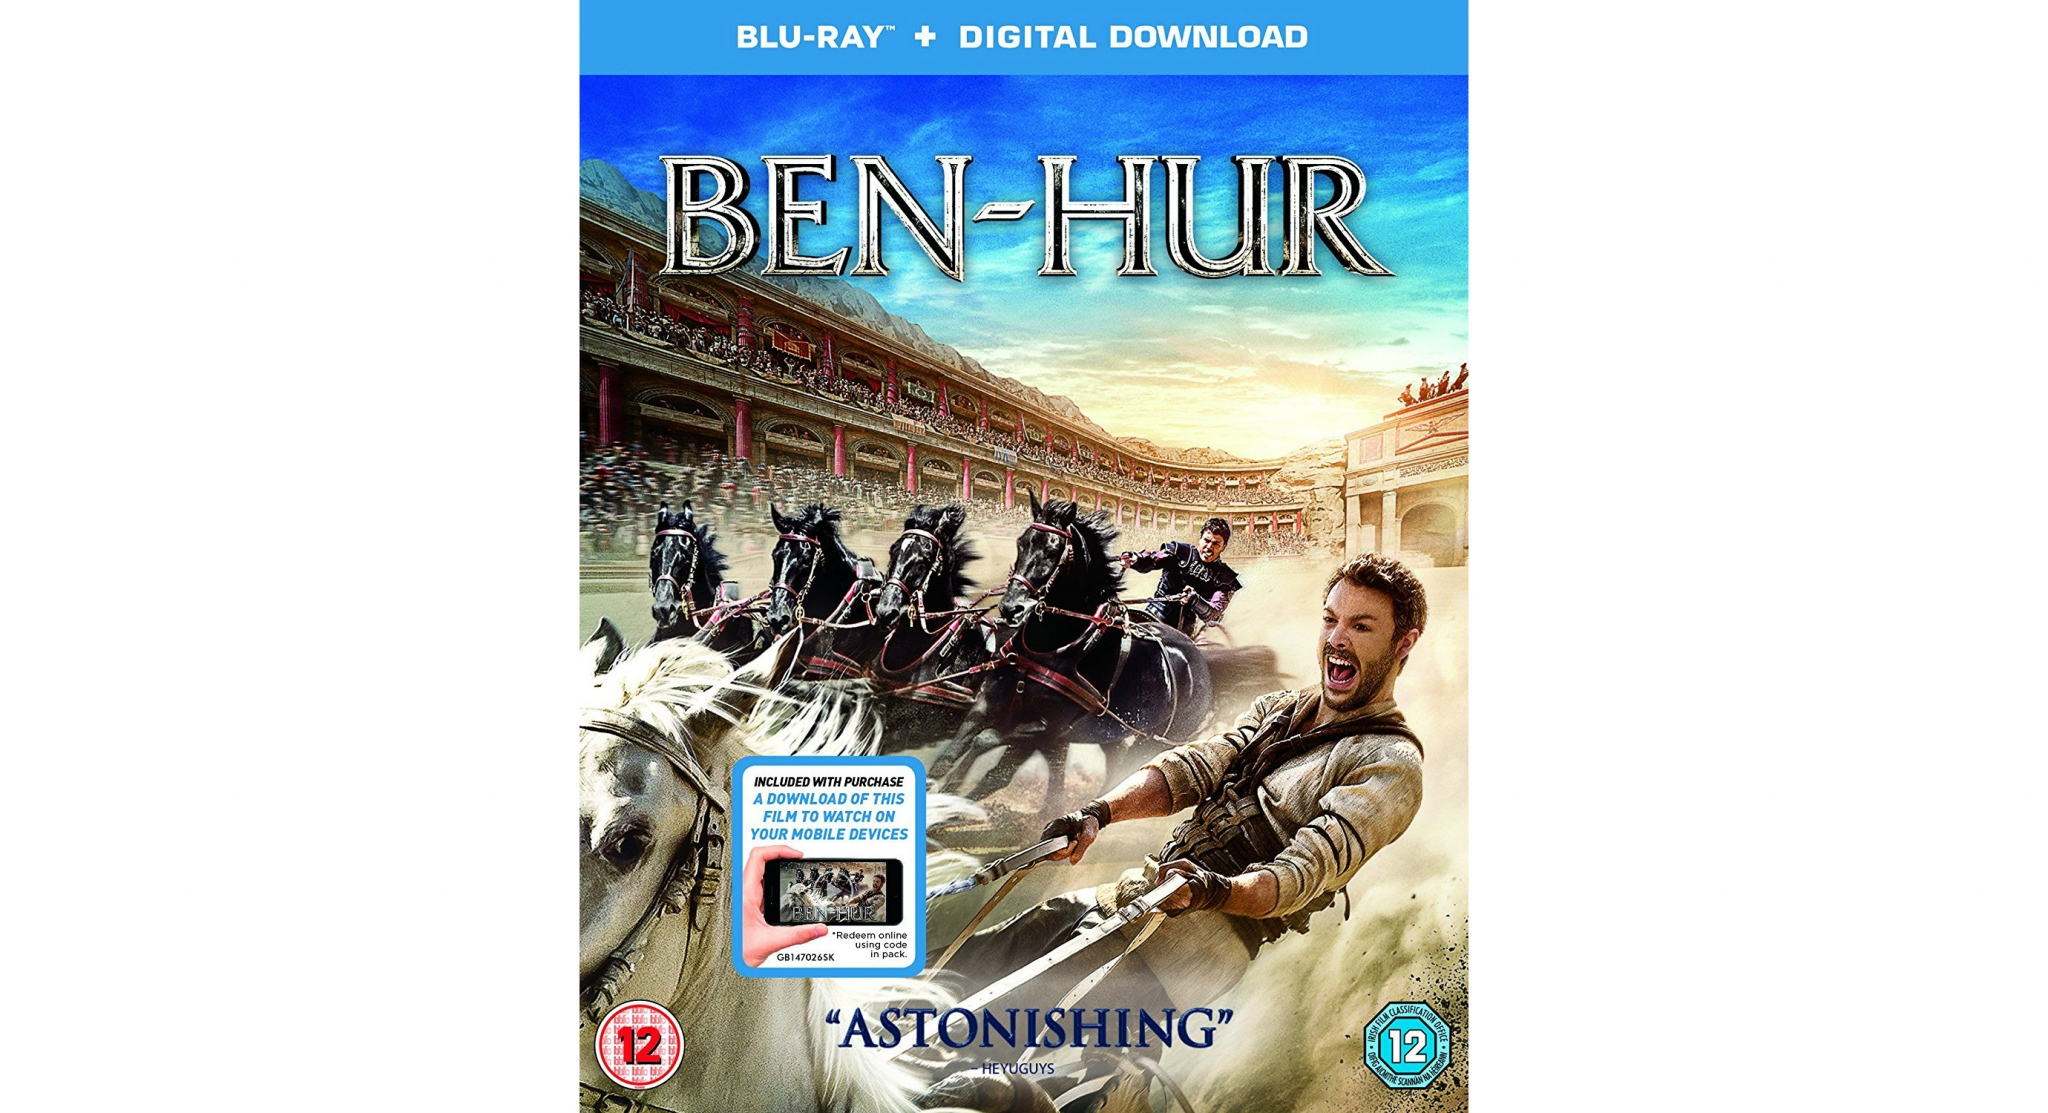 Ben-Hur 2016 Updates – Cast, Synopsis, Release Date